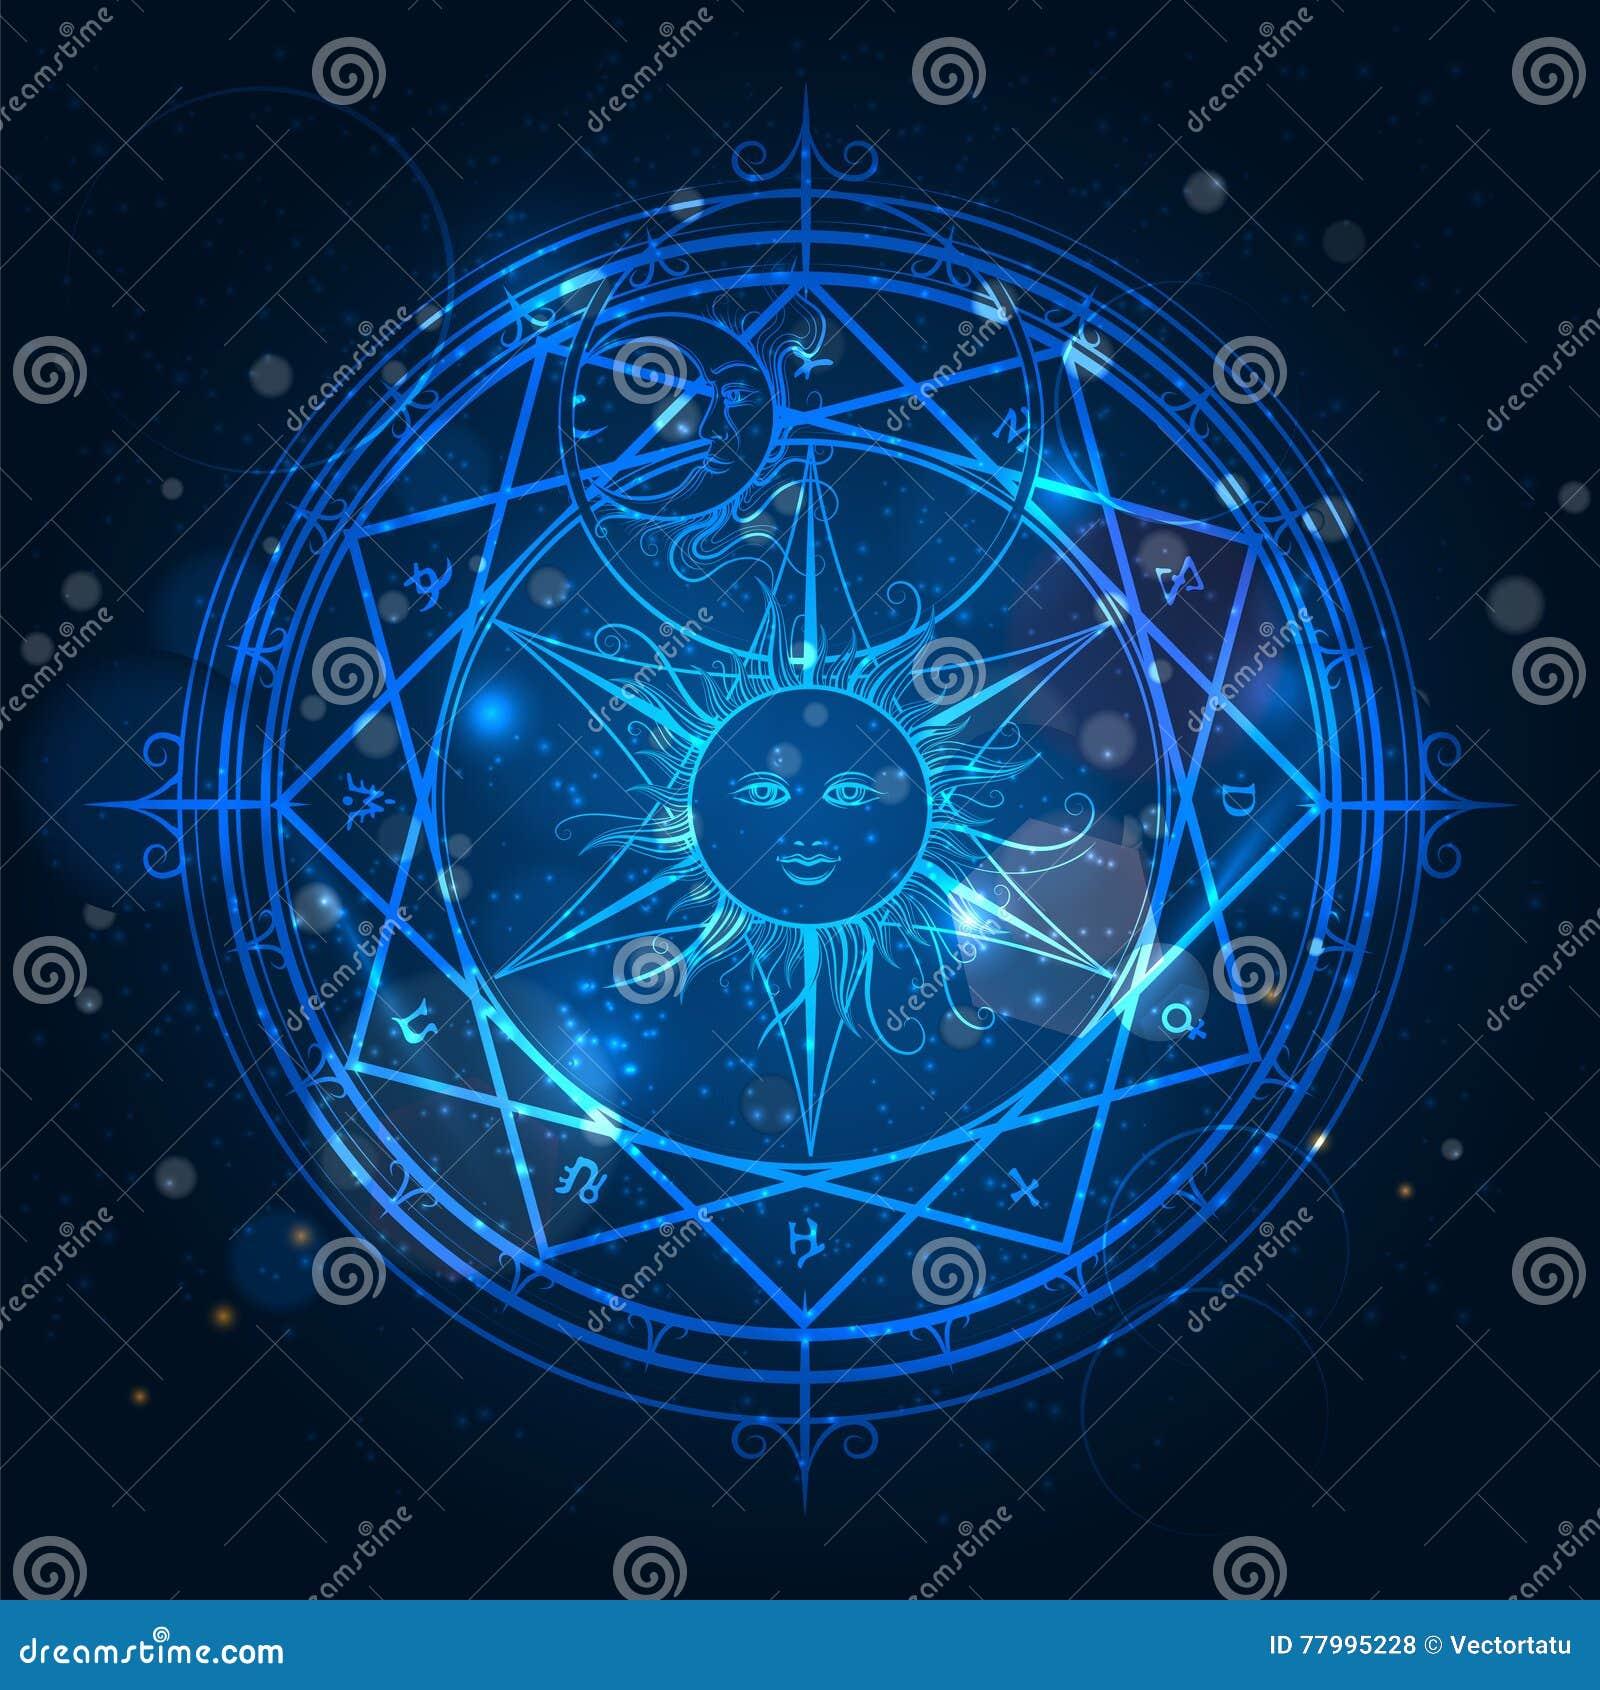 Alchemy magic circle on blue background